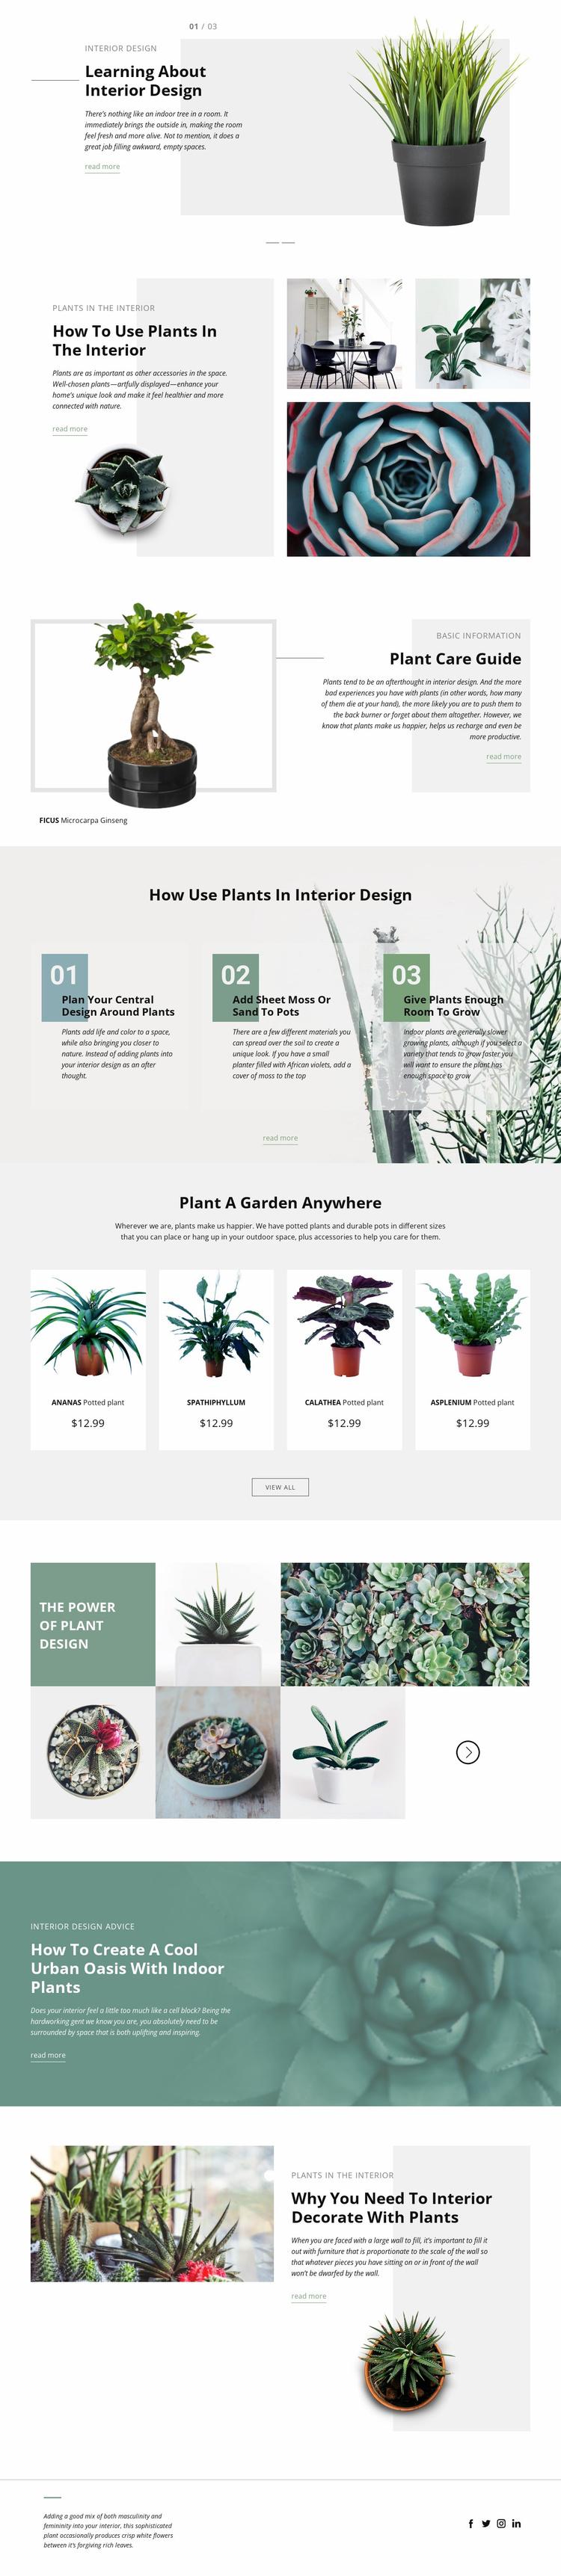 Interior Design Studio Landing Page